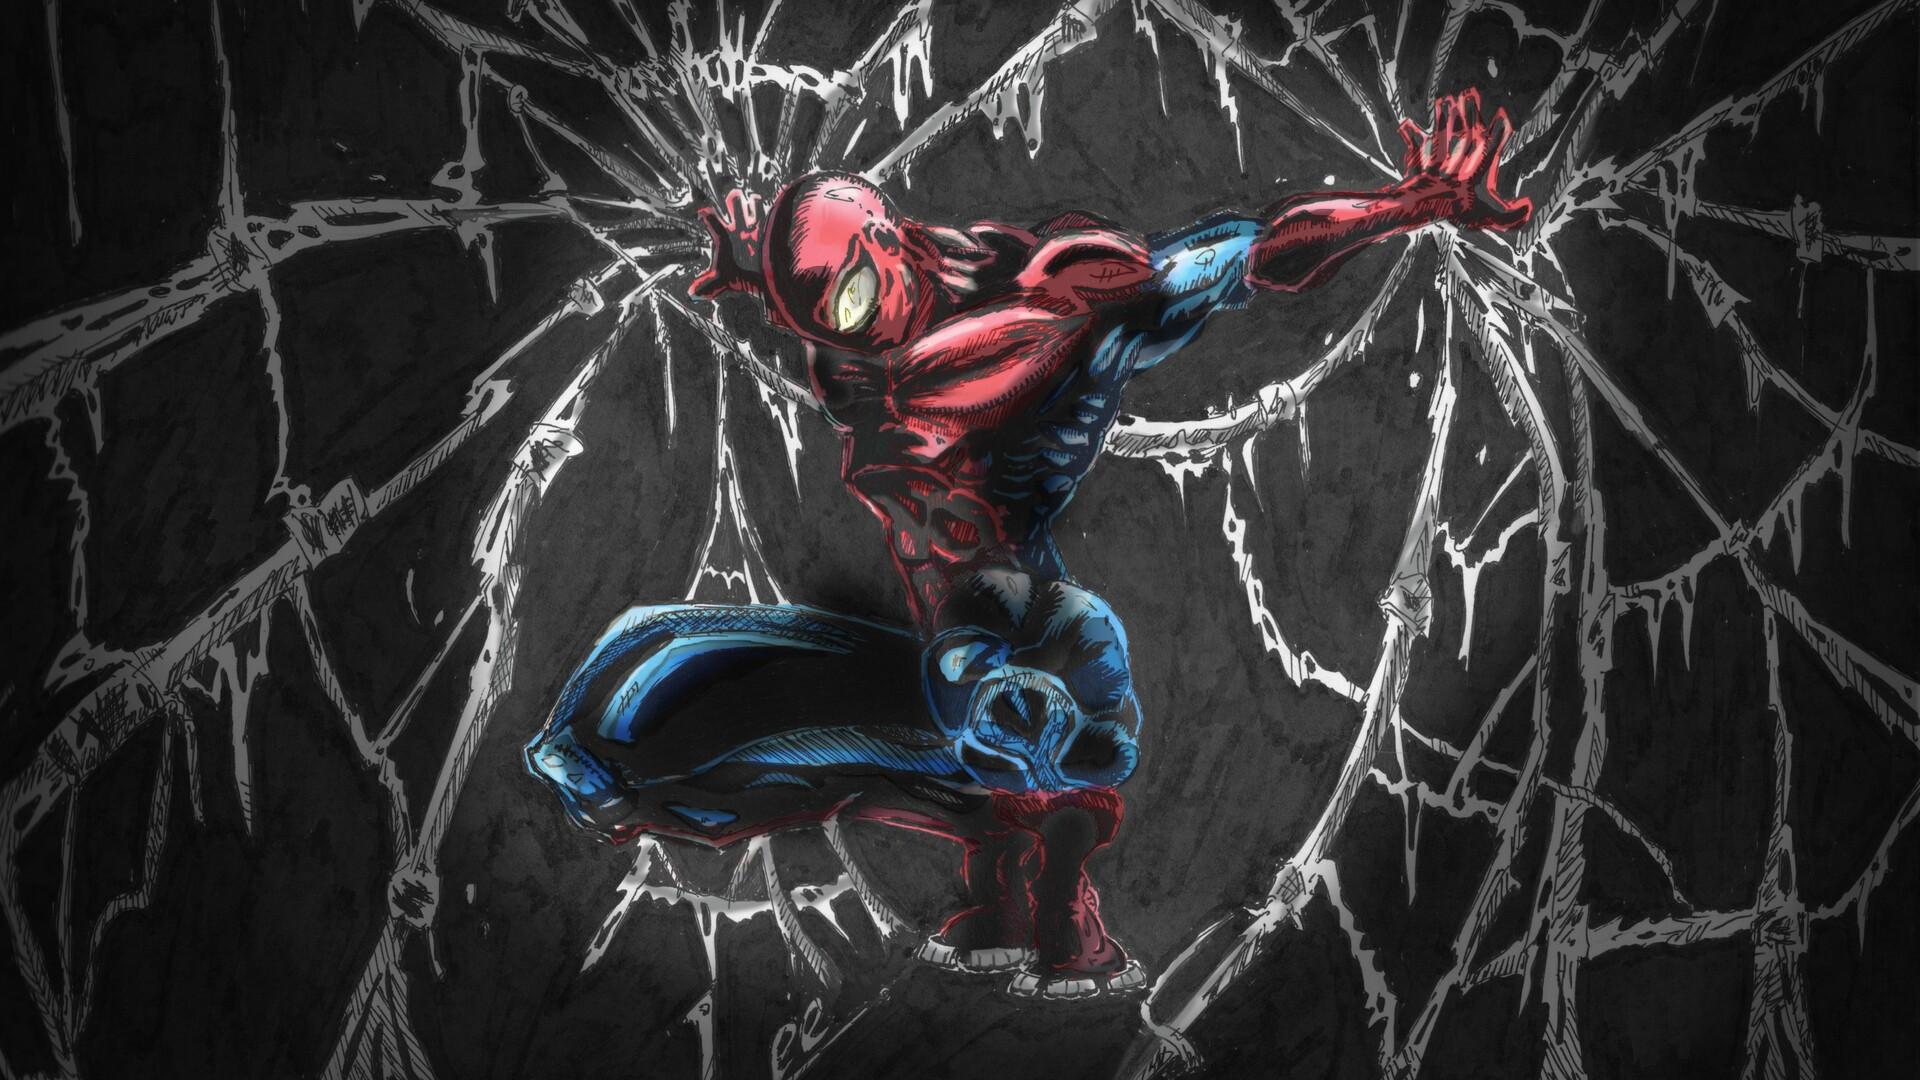 1920x1080 Spiderman Comic Art Laptop Full Hd 1080p Hd 4k Wallpapers